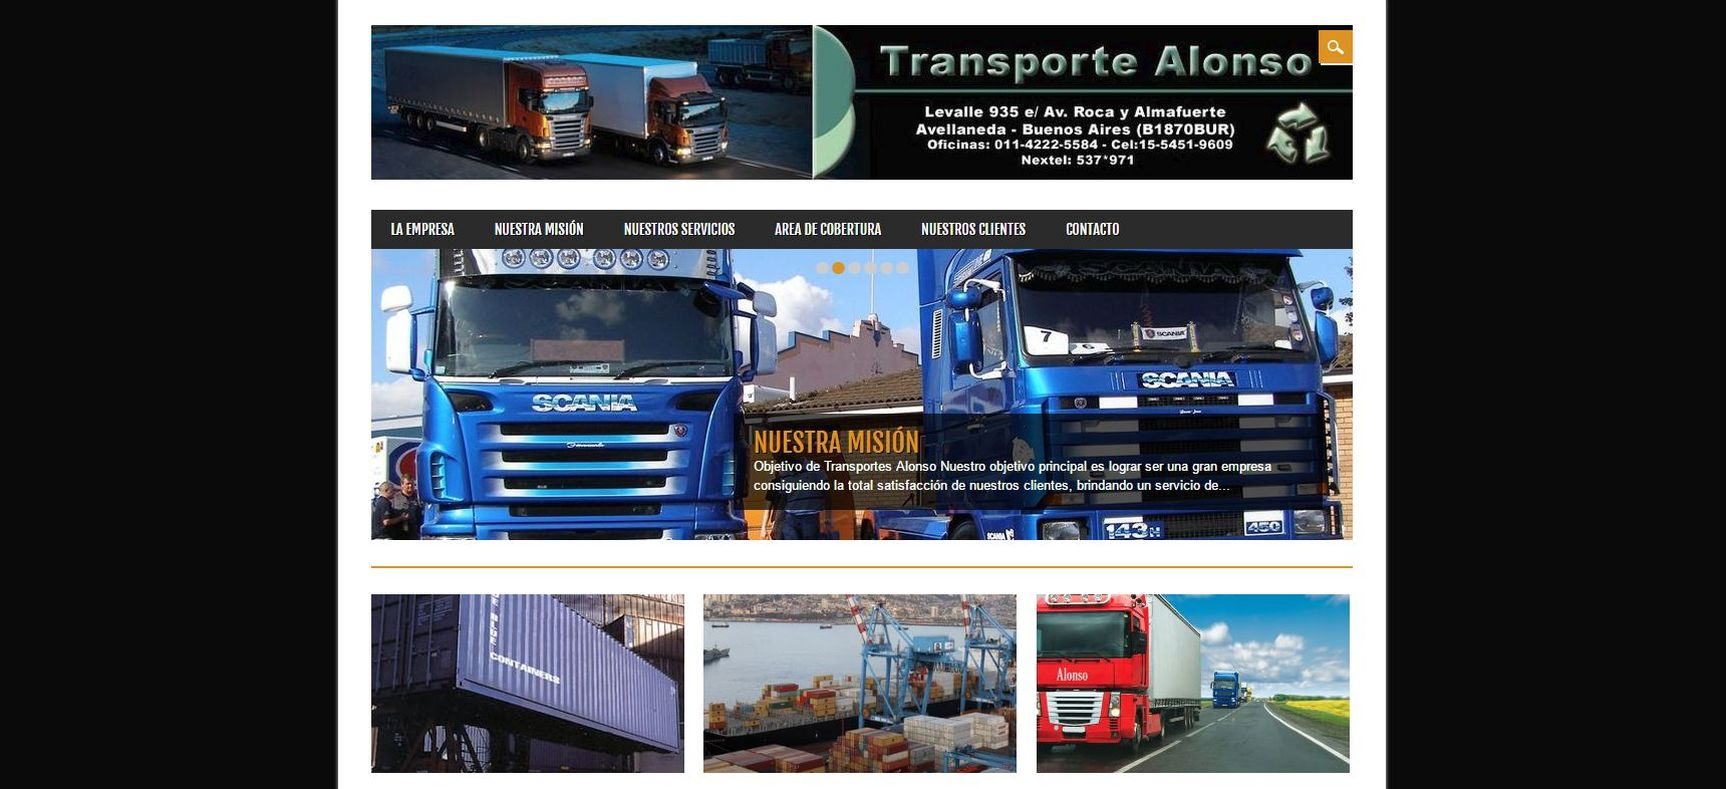 transportes-alonso-argentina